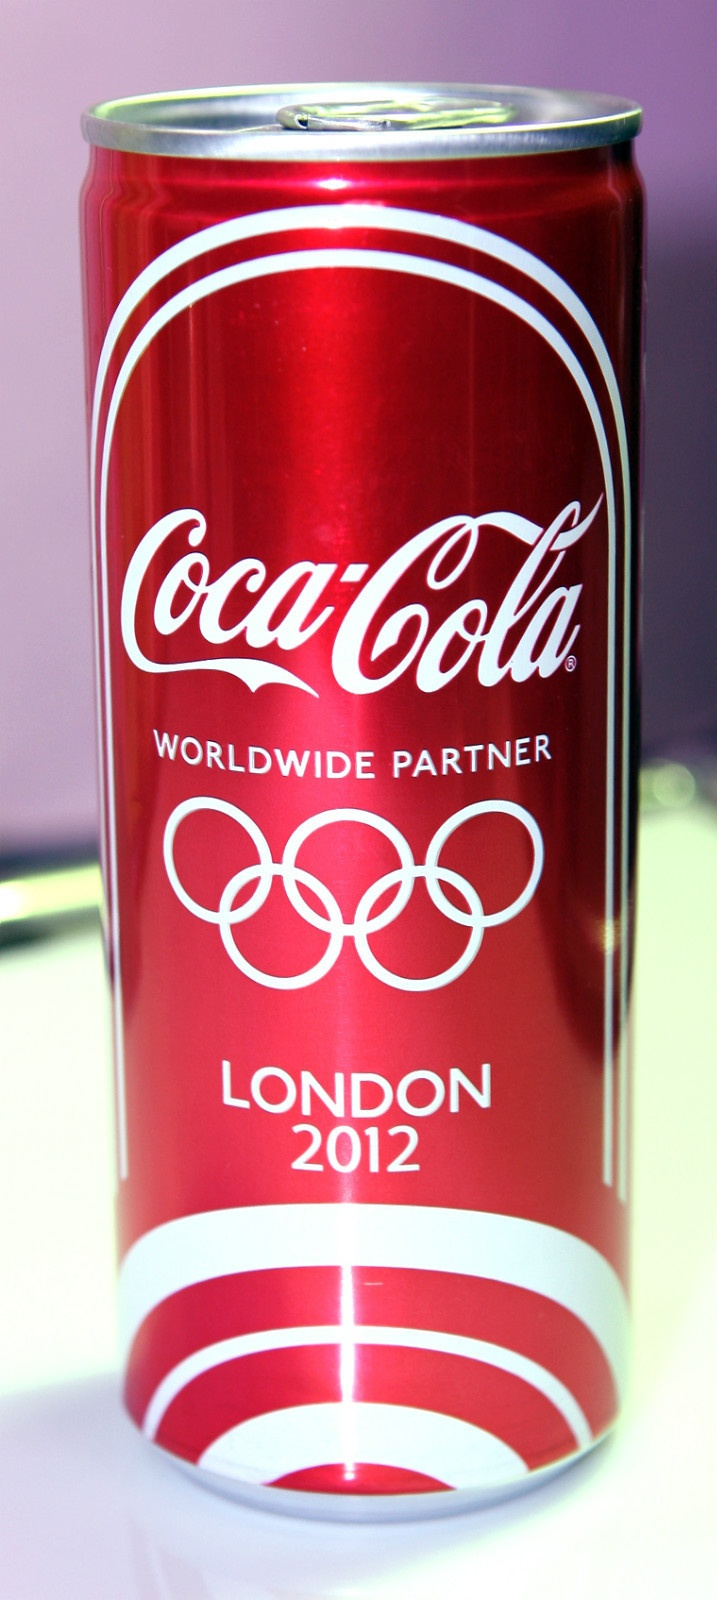 Korea Tall London Olympics Can - 2012